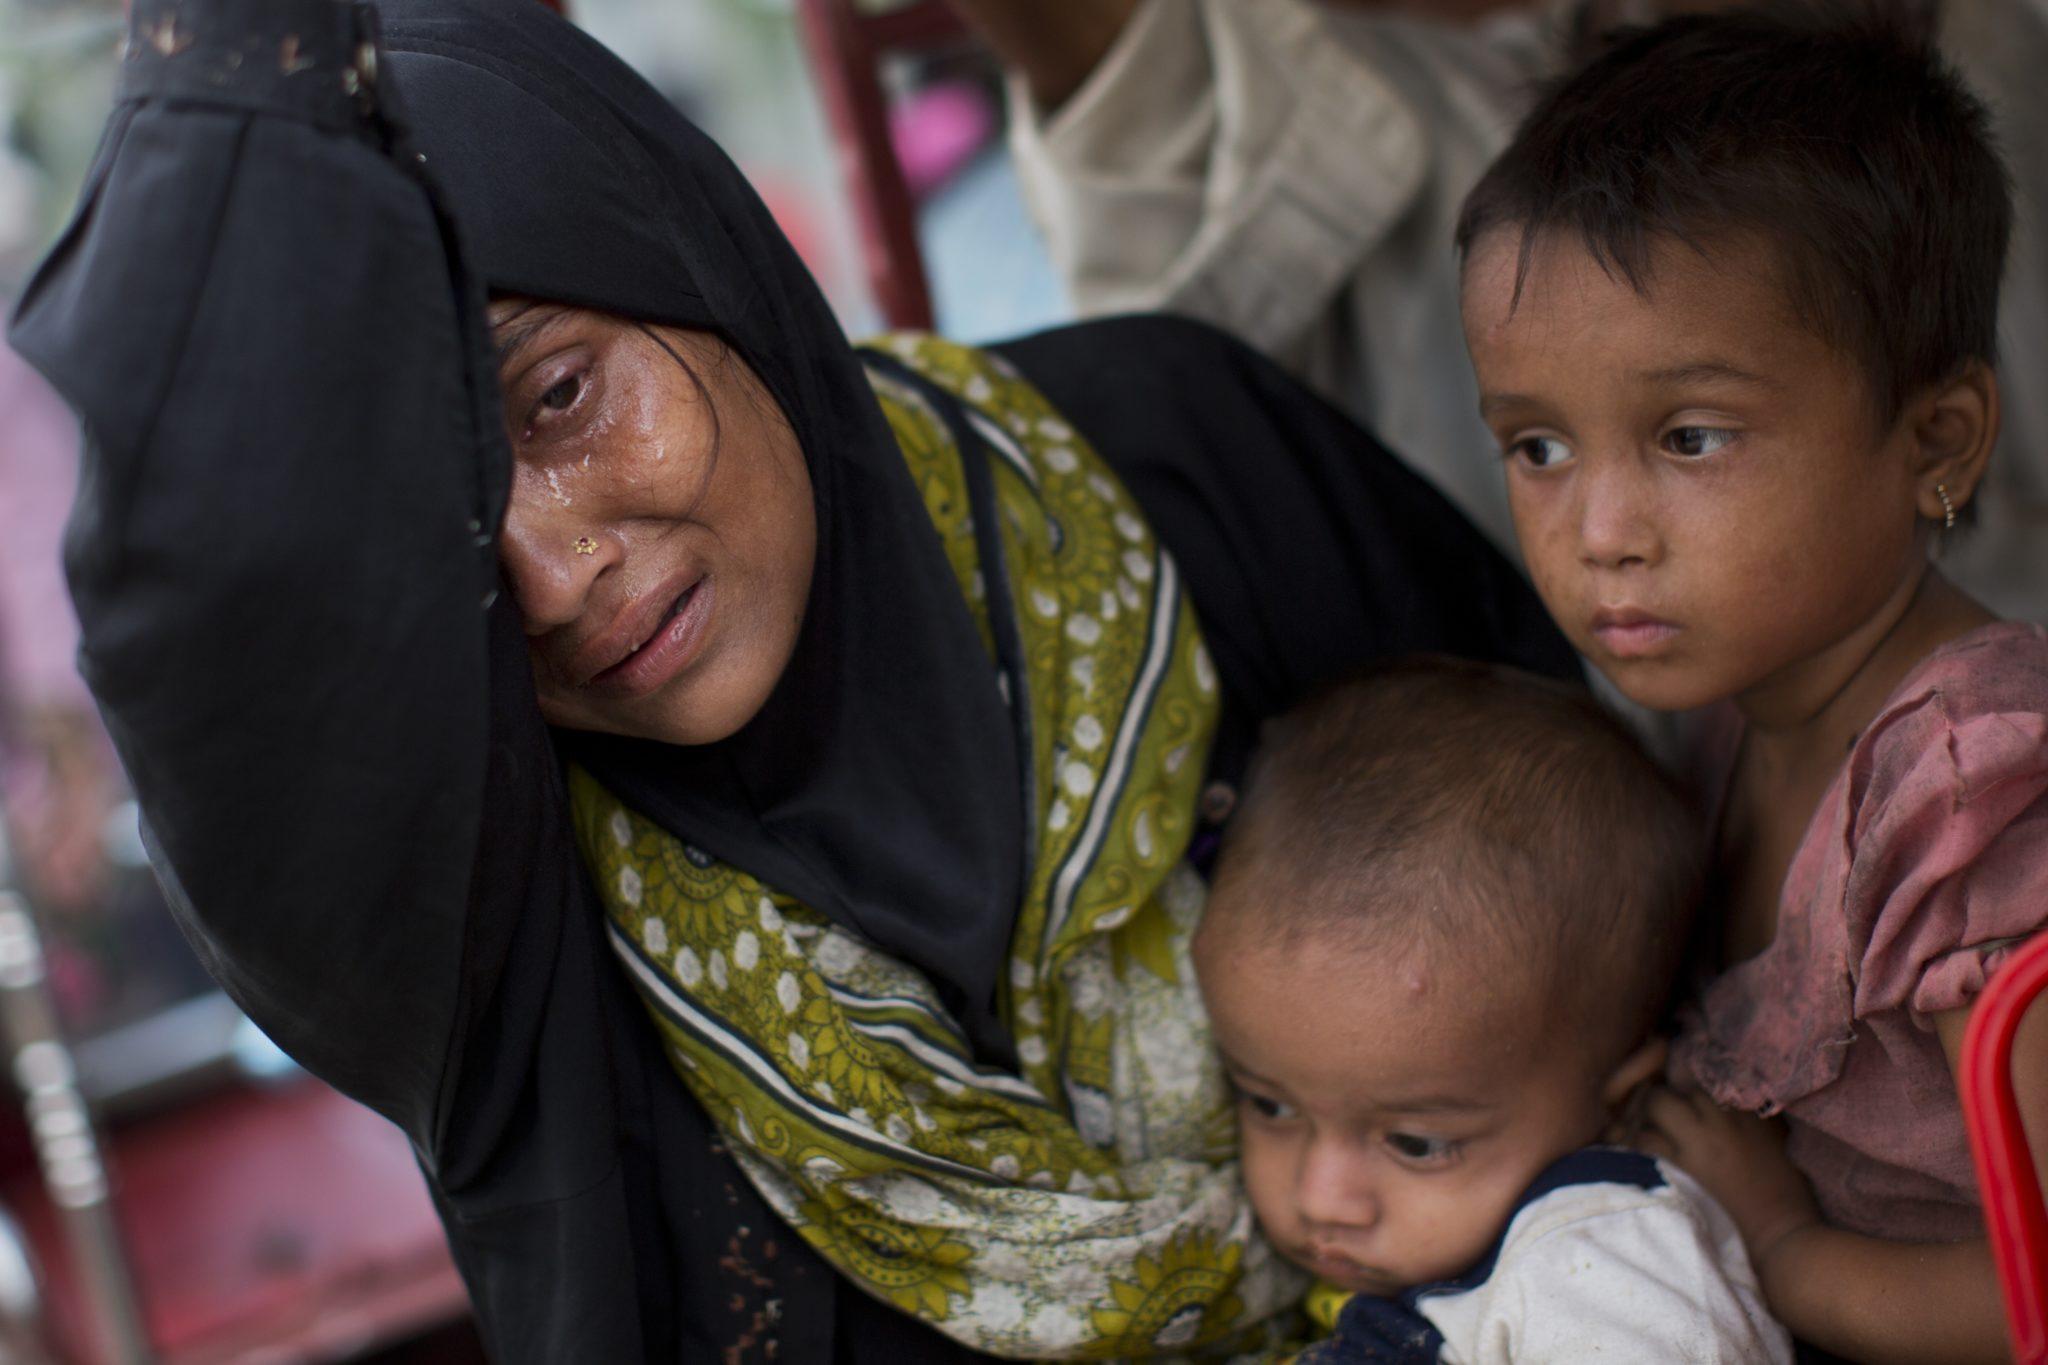 countrys muslim rohingya minority - HD1365×910